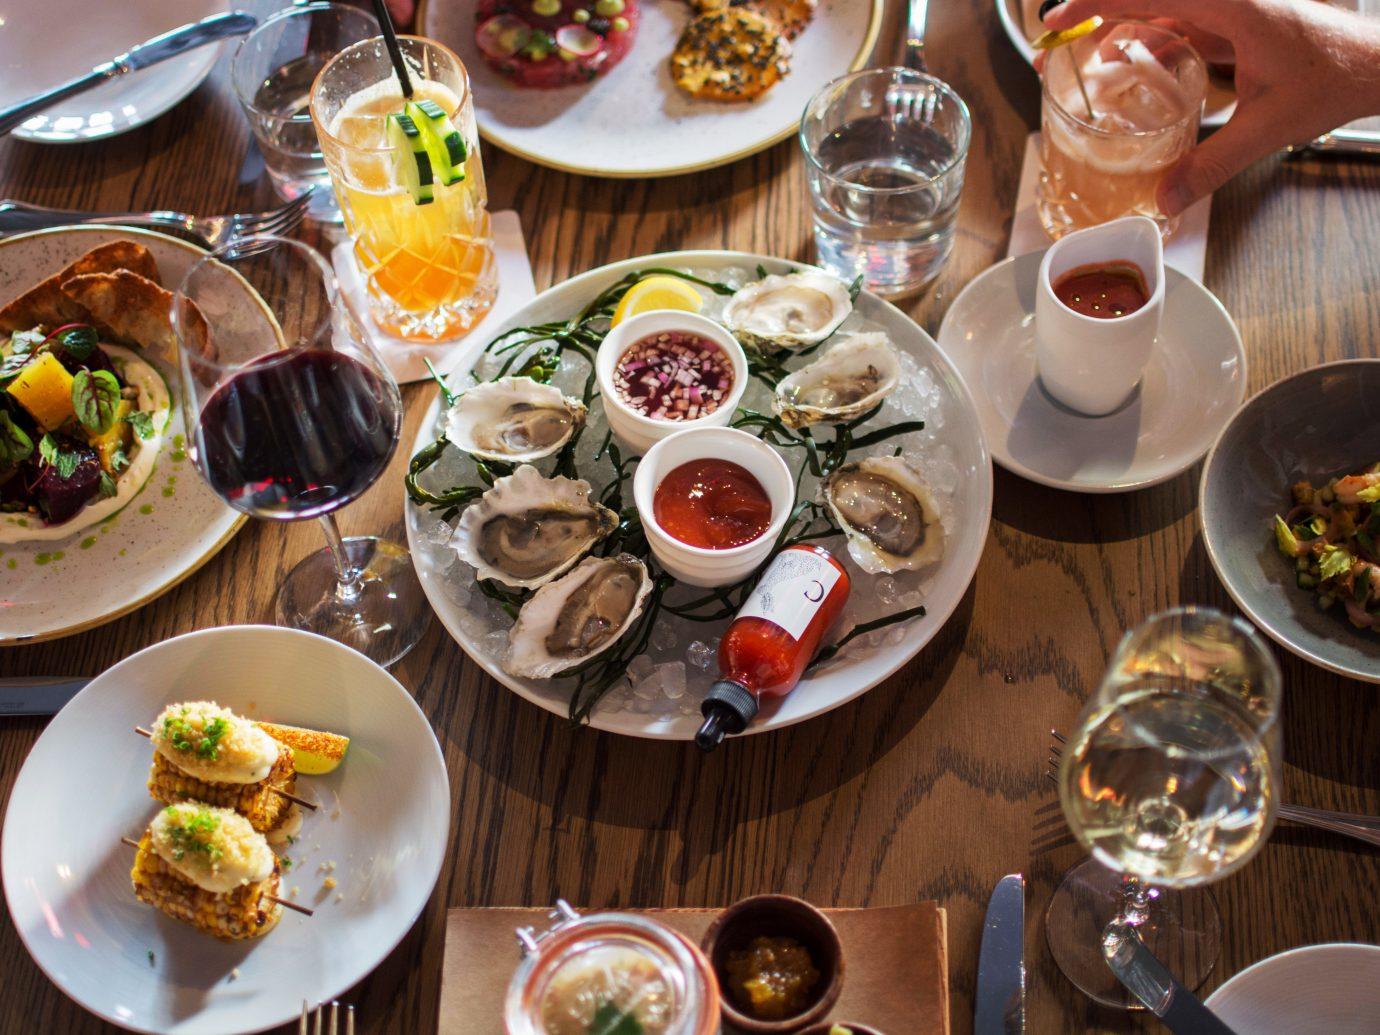 Bar Dining Drink Eat Food + Drink Hotels Luxury Trip Ideas plate table food meal dish lunch brunch dinner supper breakfast restaurant cuisine sense buffet set several